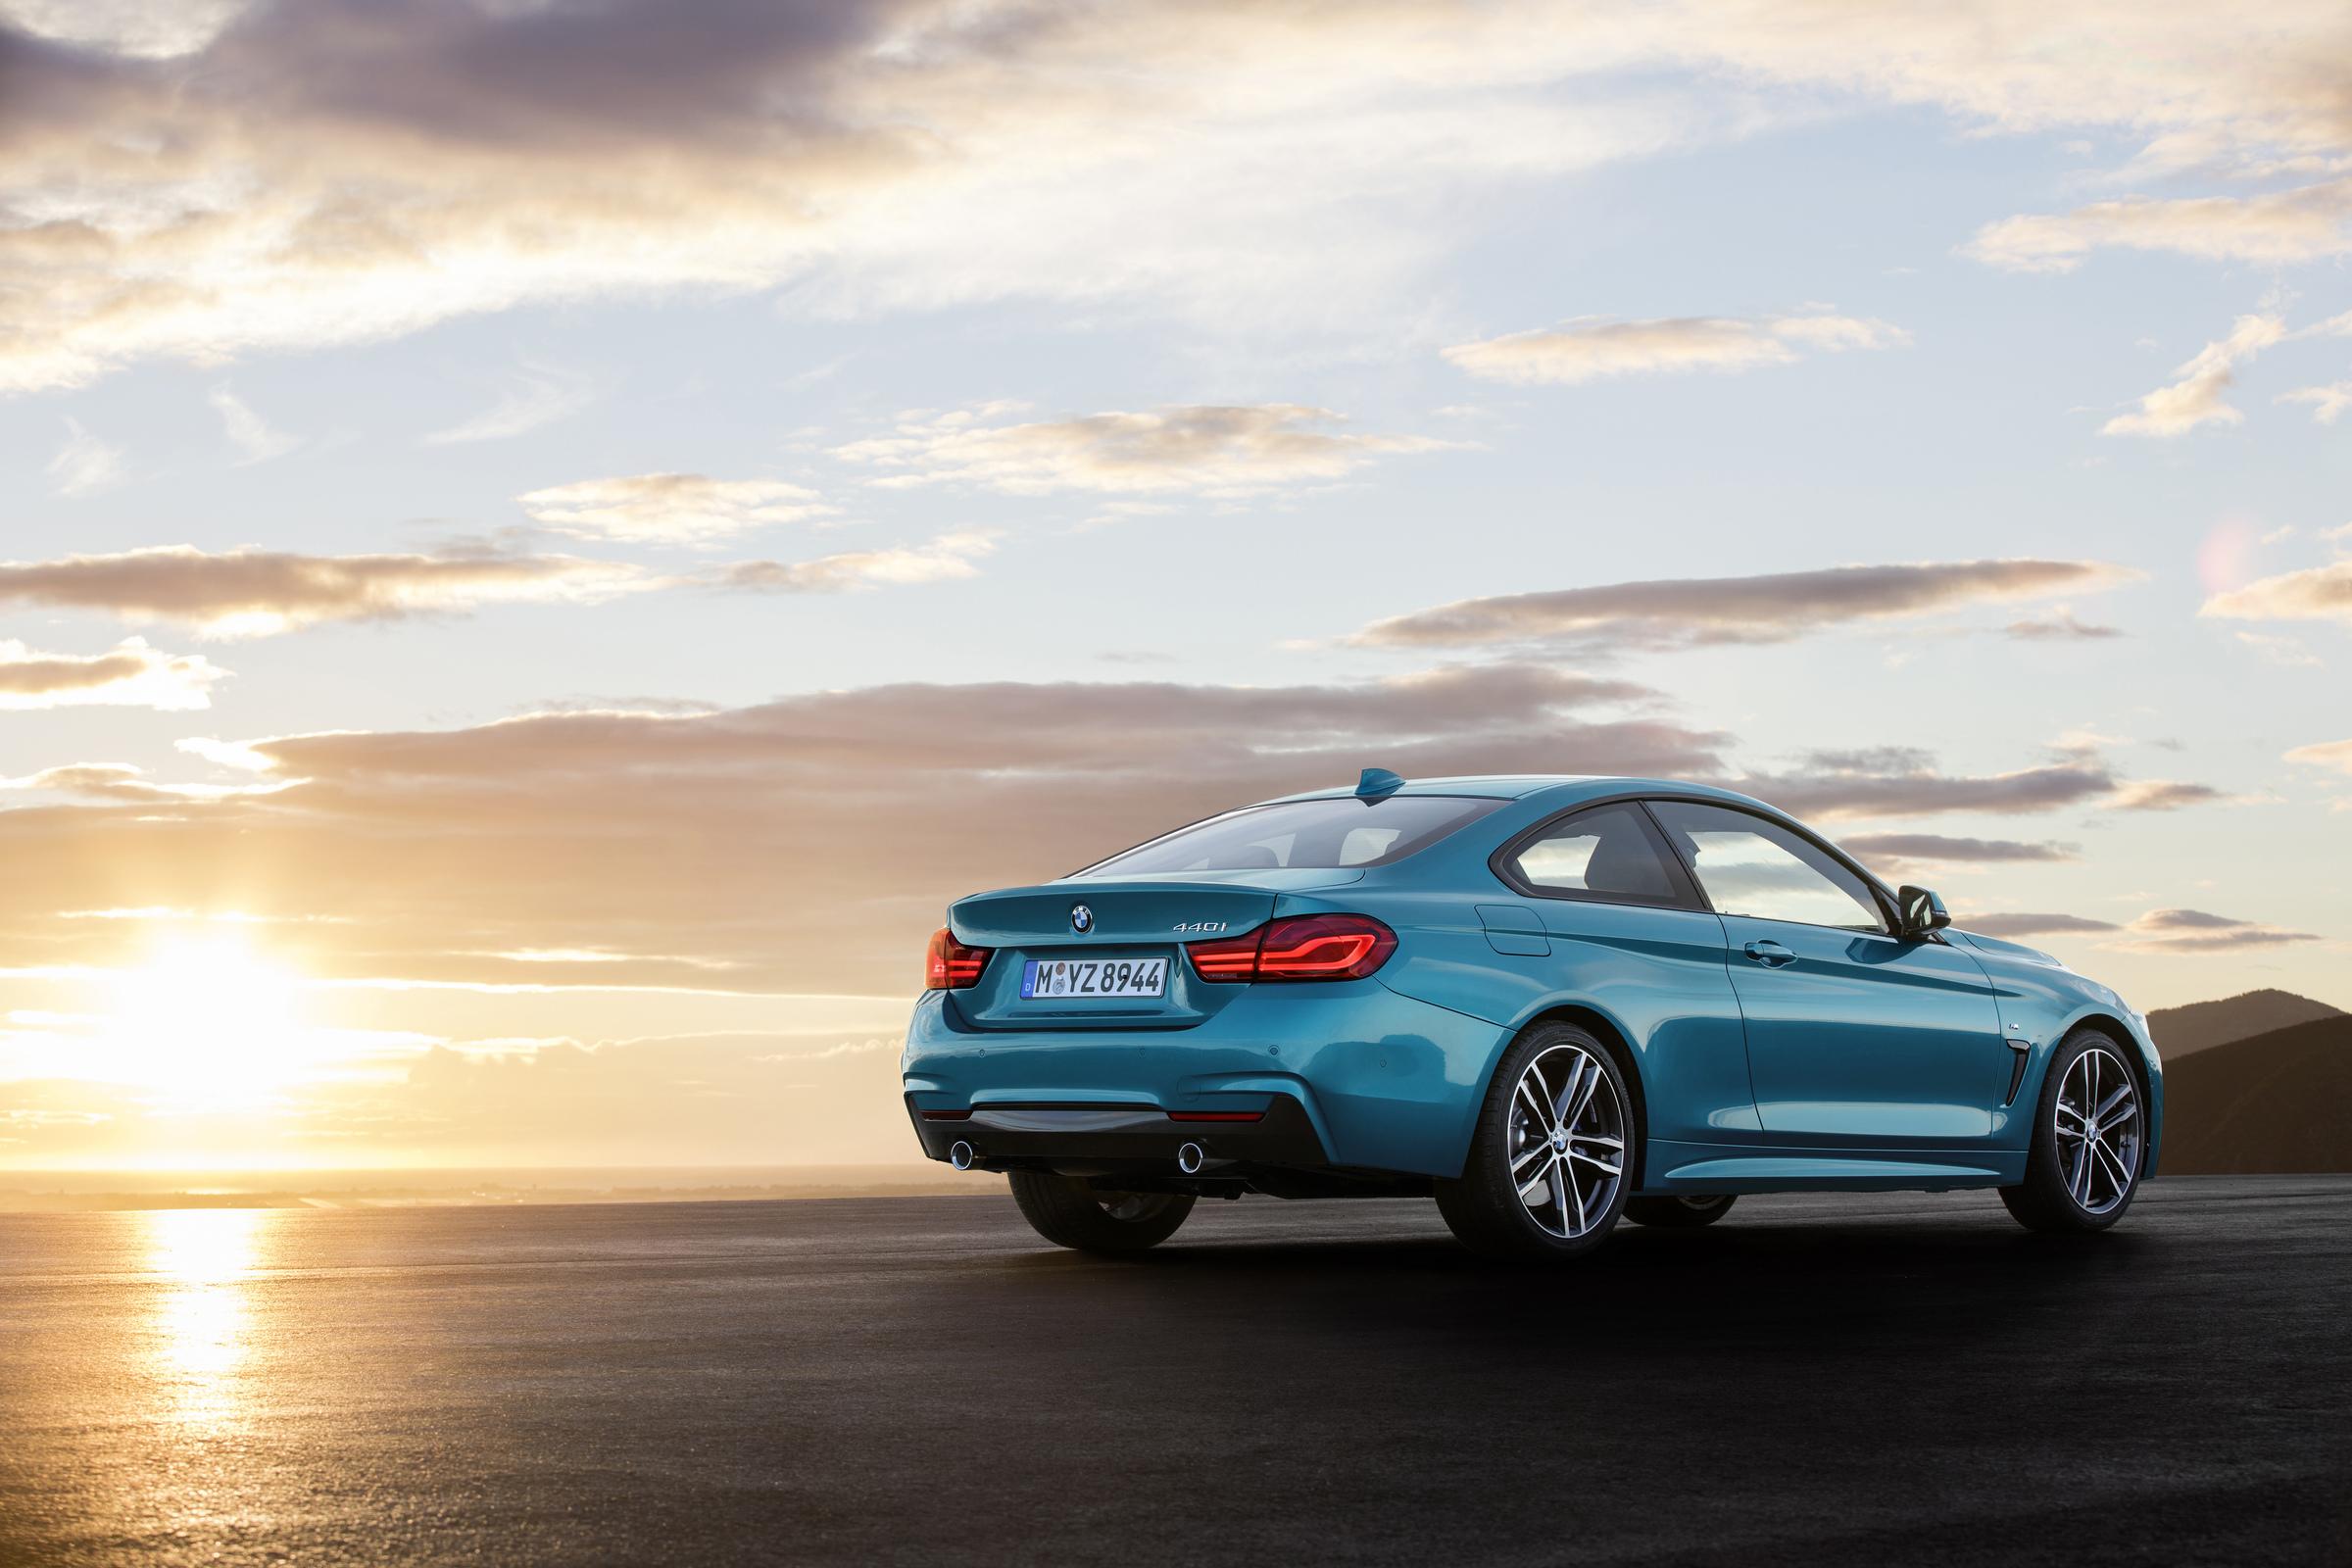 BMW 4er Coupé im Sonnenuntergang